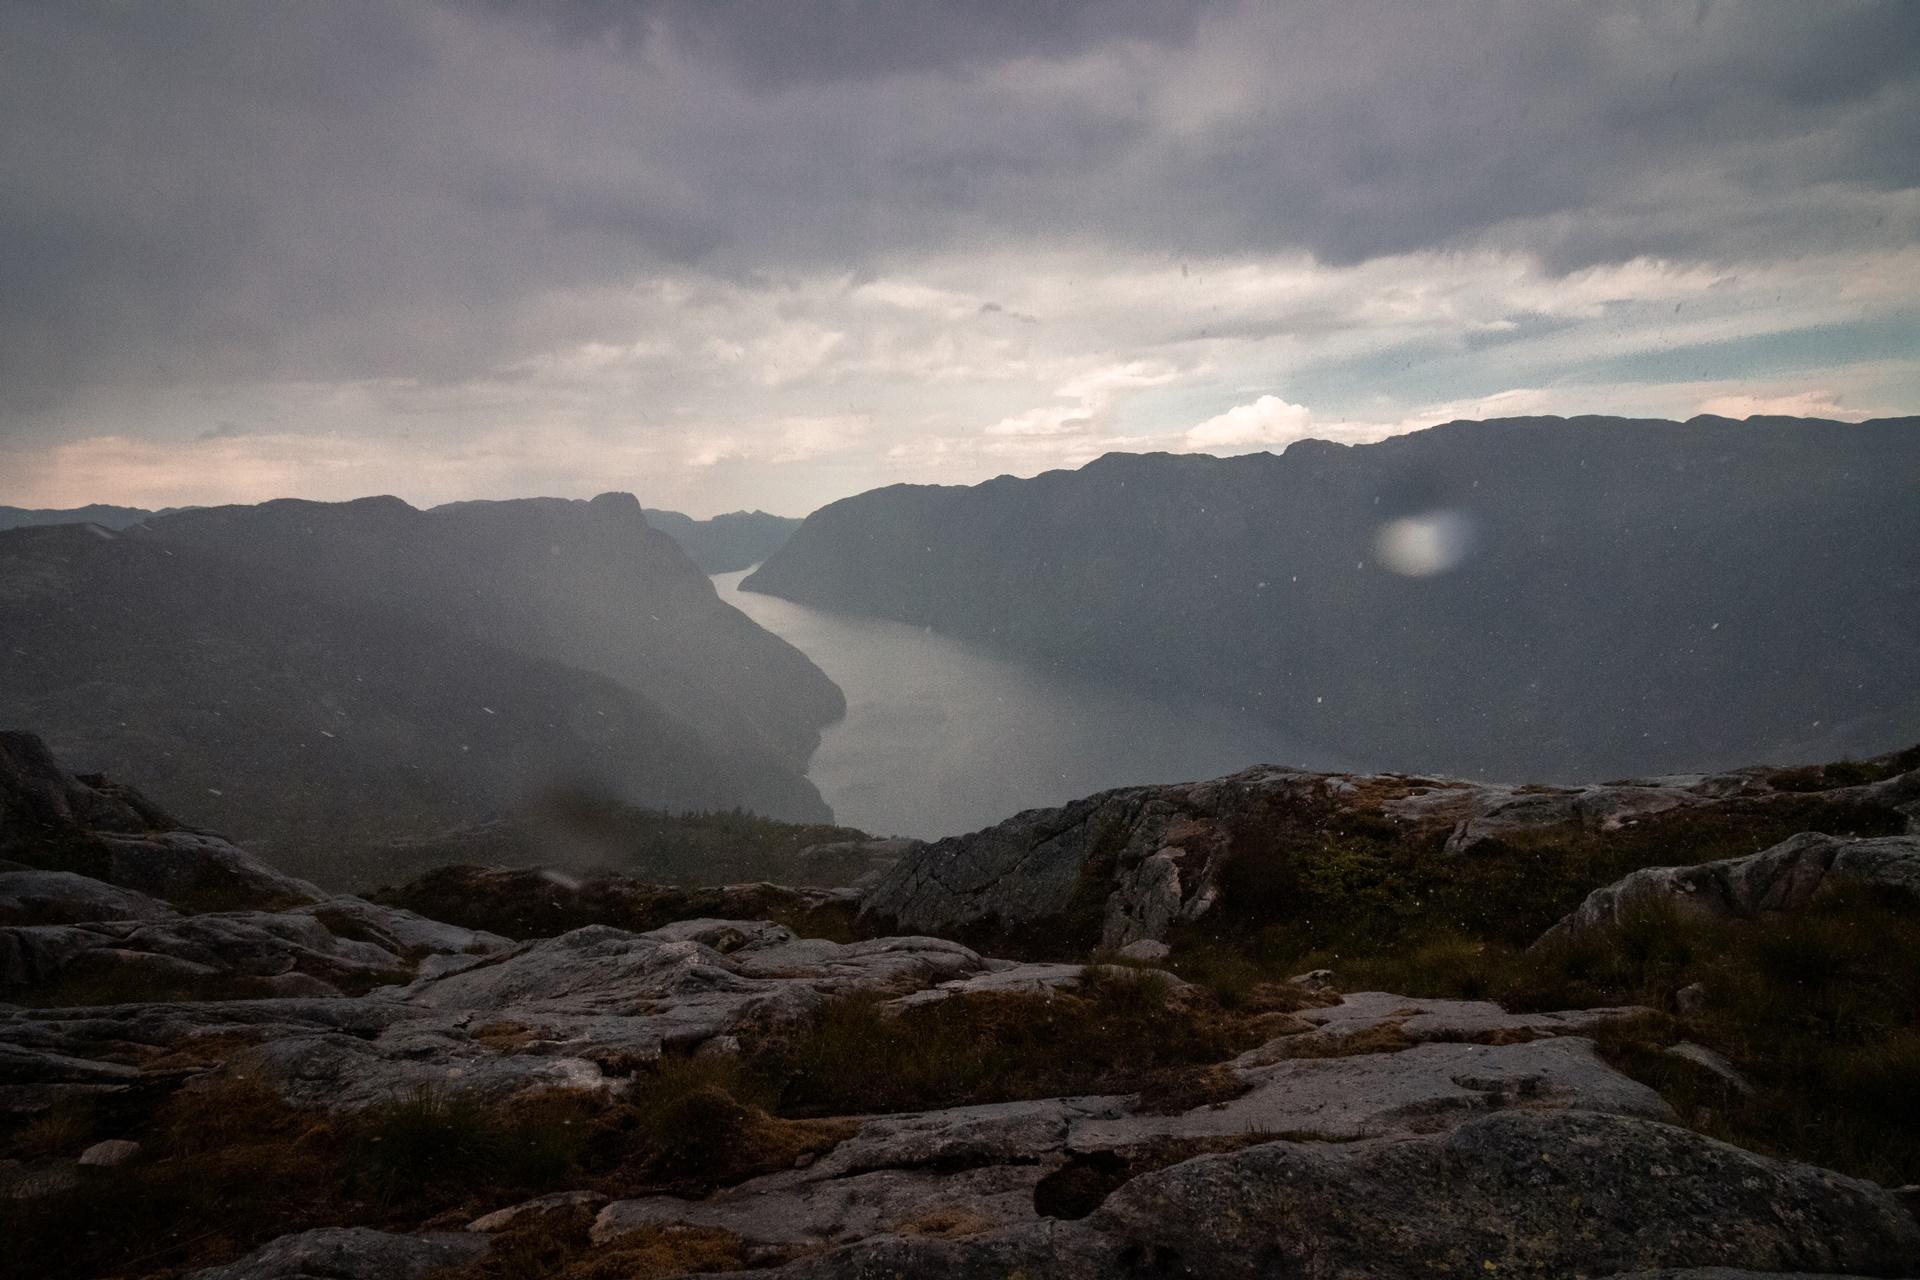 traveling fjord rainstorm Norway